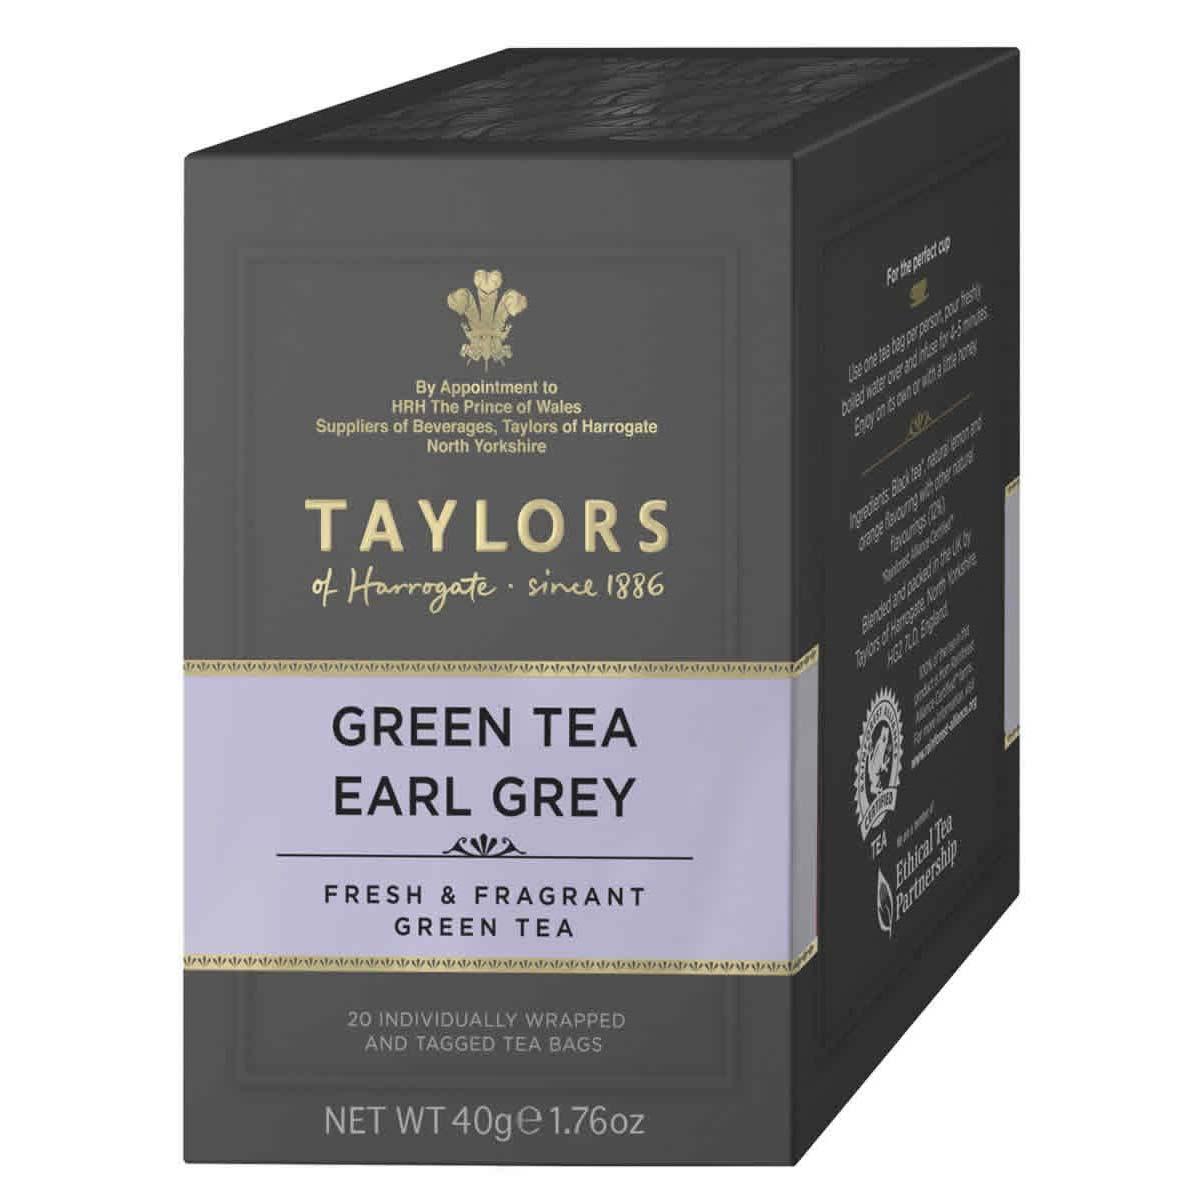 Top Food Feinkost - Taylors of Harrogate Green Tea Earl Grey 40g - 20 Aufgussbeutel |Grüner Earl Grey Tee mit Bergamottearoma in einer praktischen Portionierpackung